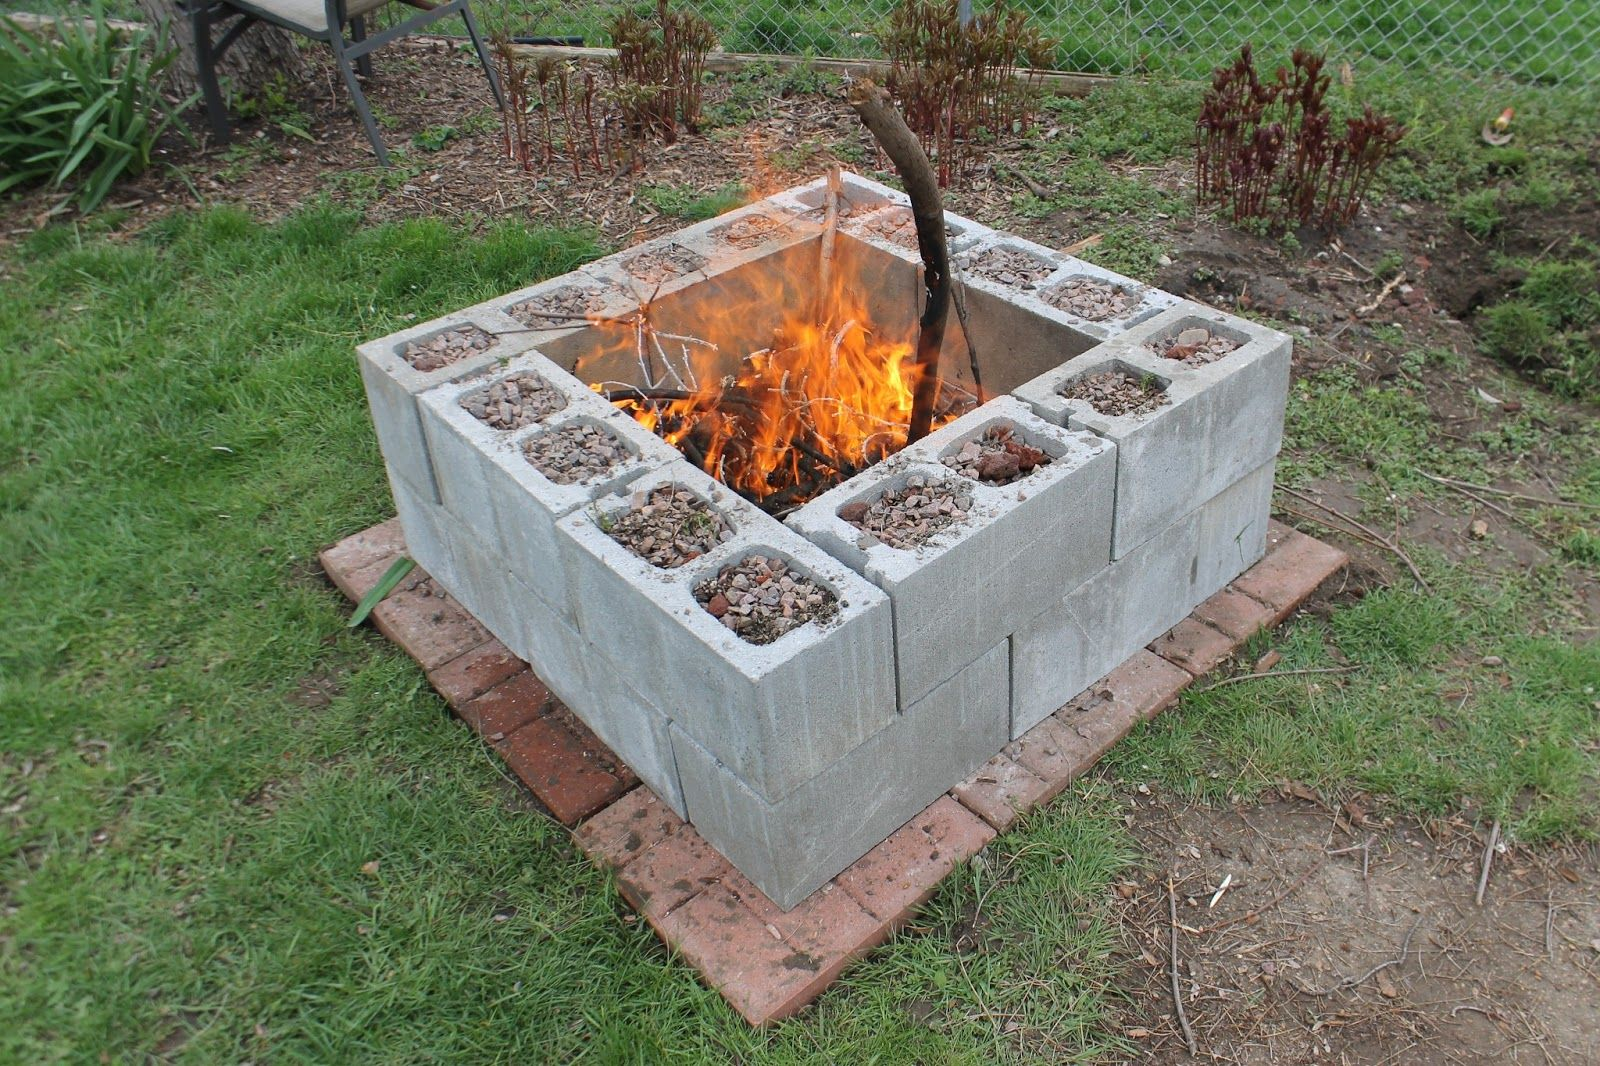 Must Add Fabric Softener Fire And Chocolate Cinder Block Garden Cinder Block Fire Pit Backyard Fire